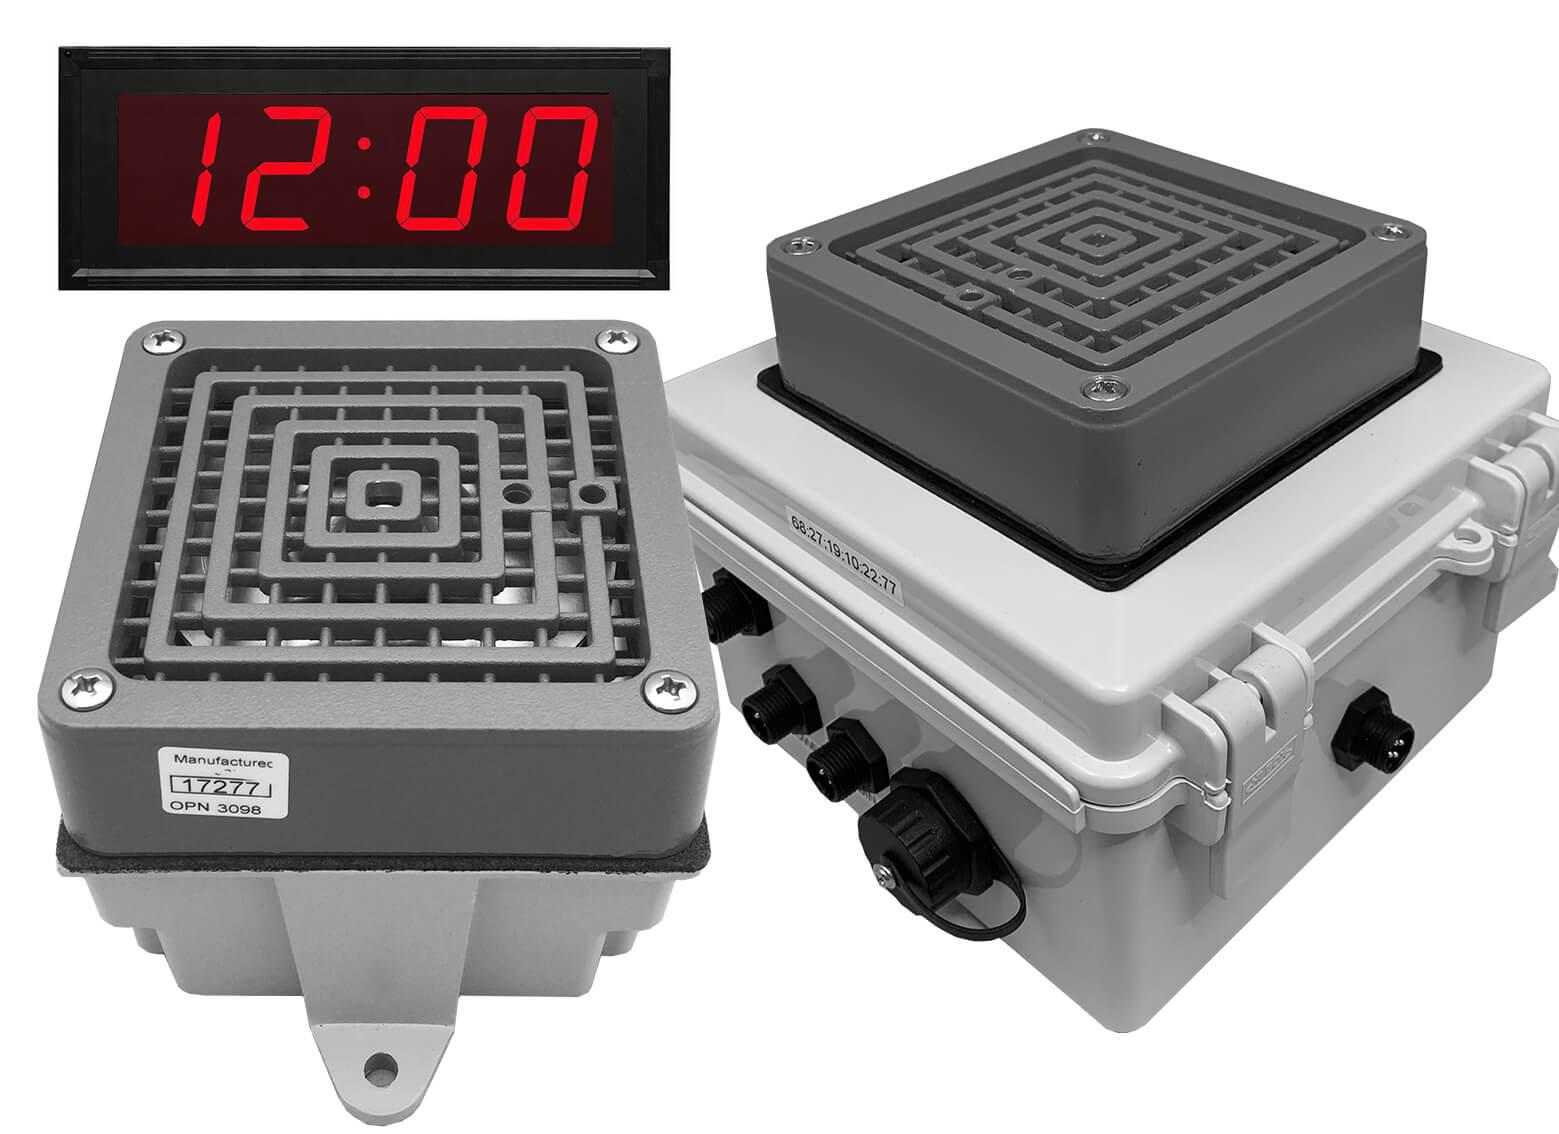 Netbell-KB-E1-C Network All-in-One Extra Loud Break Buzzer Clock System (2 Buzzers System)